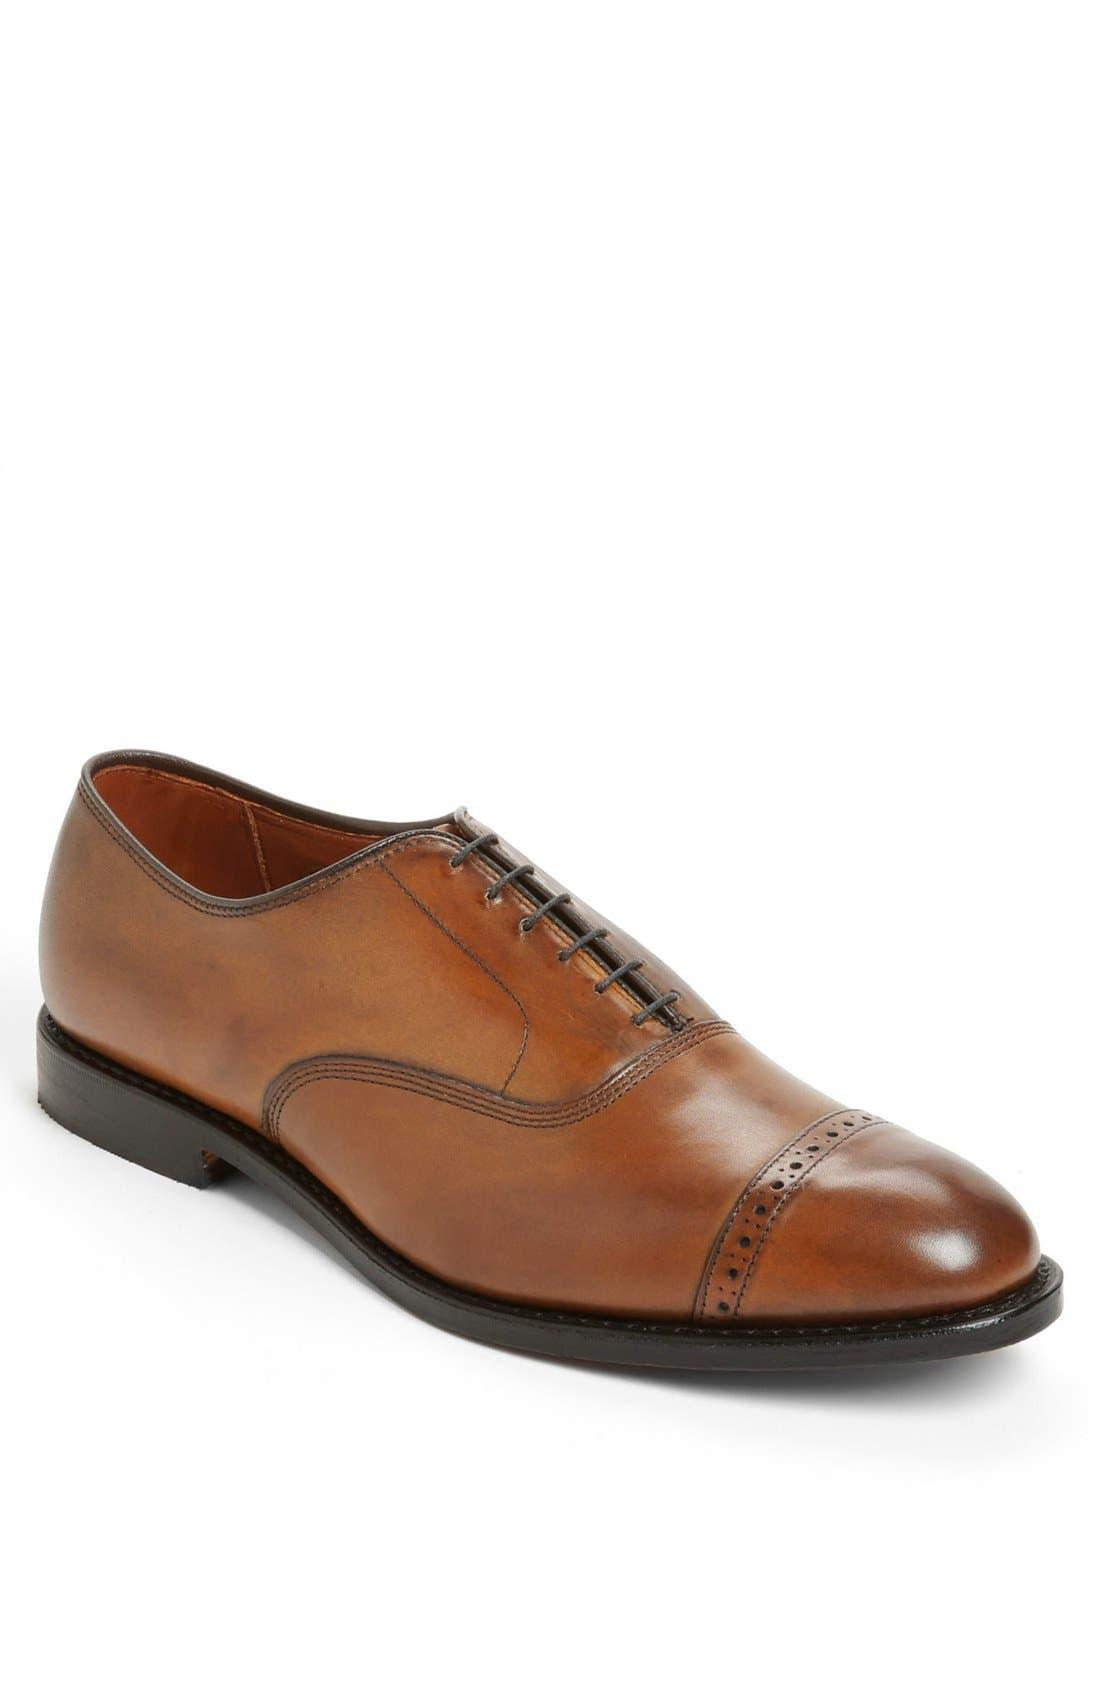 ... UPC 745195347270 product image for Allen Edmonds  Fifth Avenue  Oxford  (Men) Walnut ... 8b09a193b60